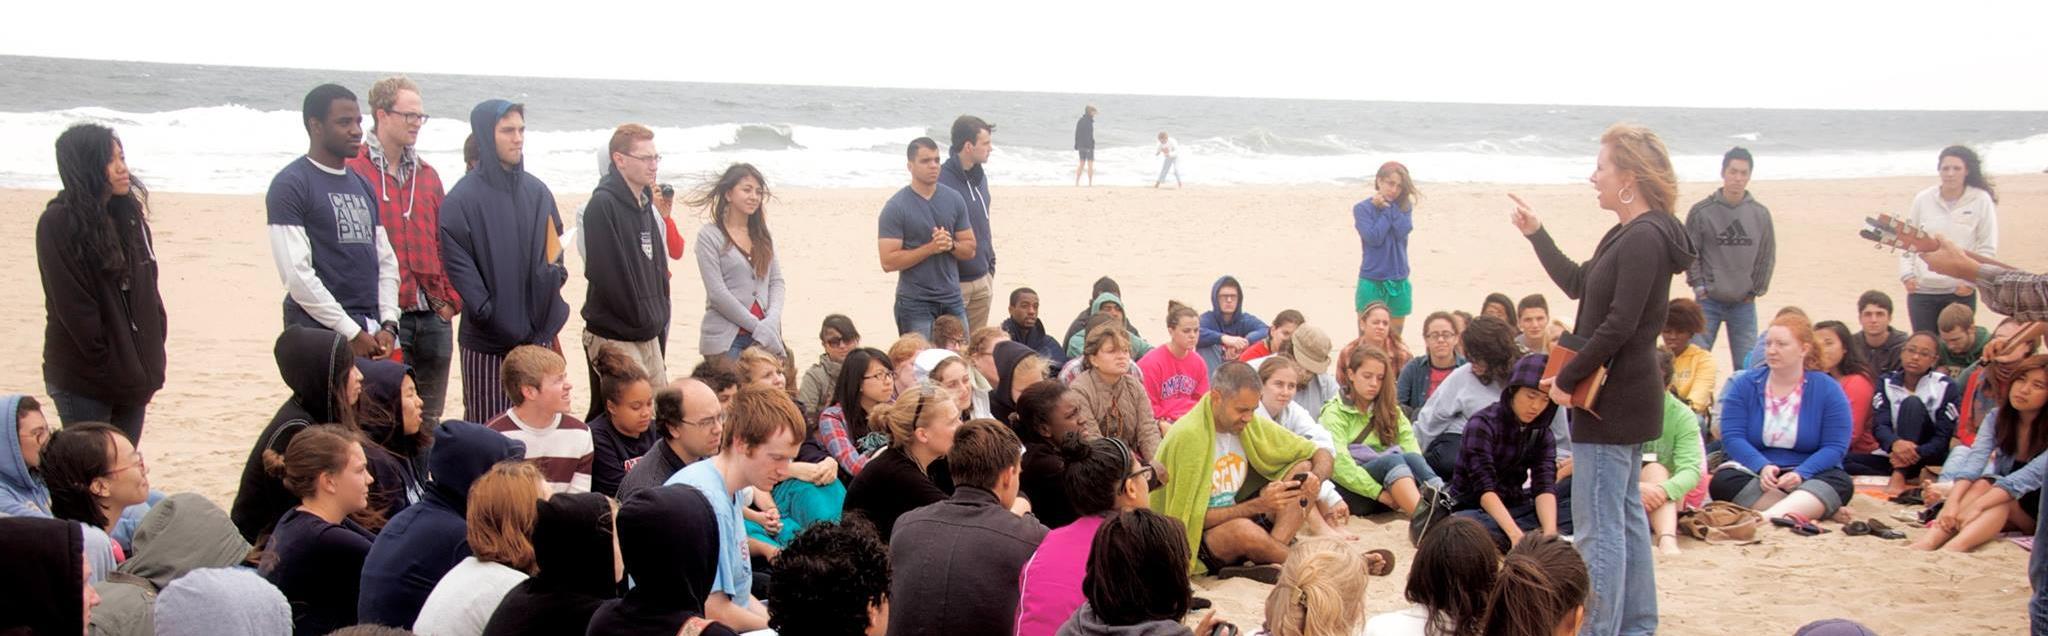 Beach Retreat - 2012